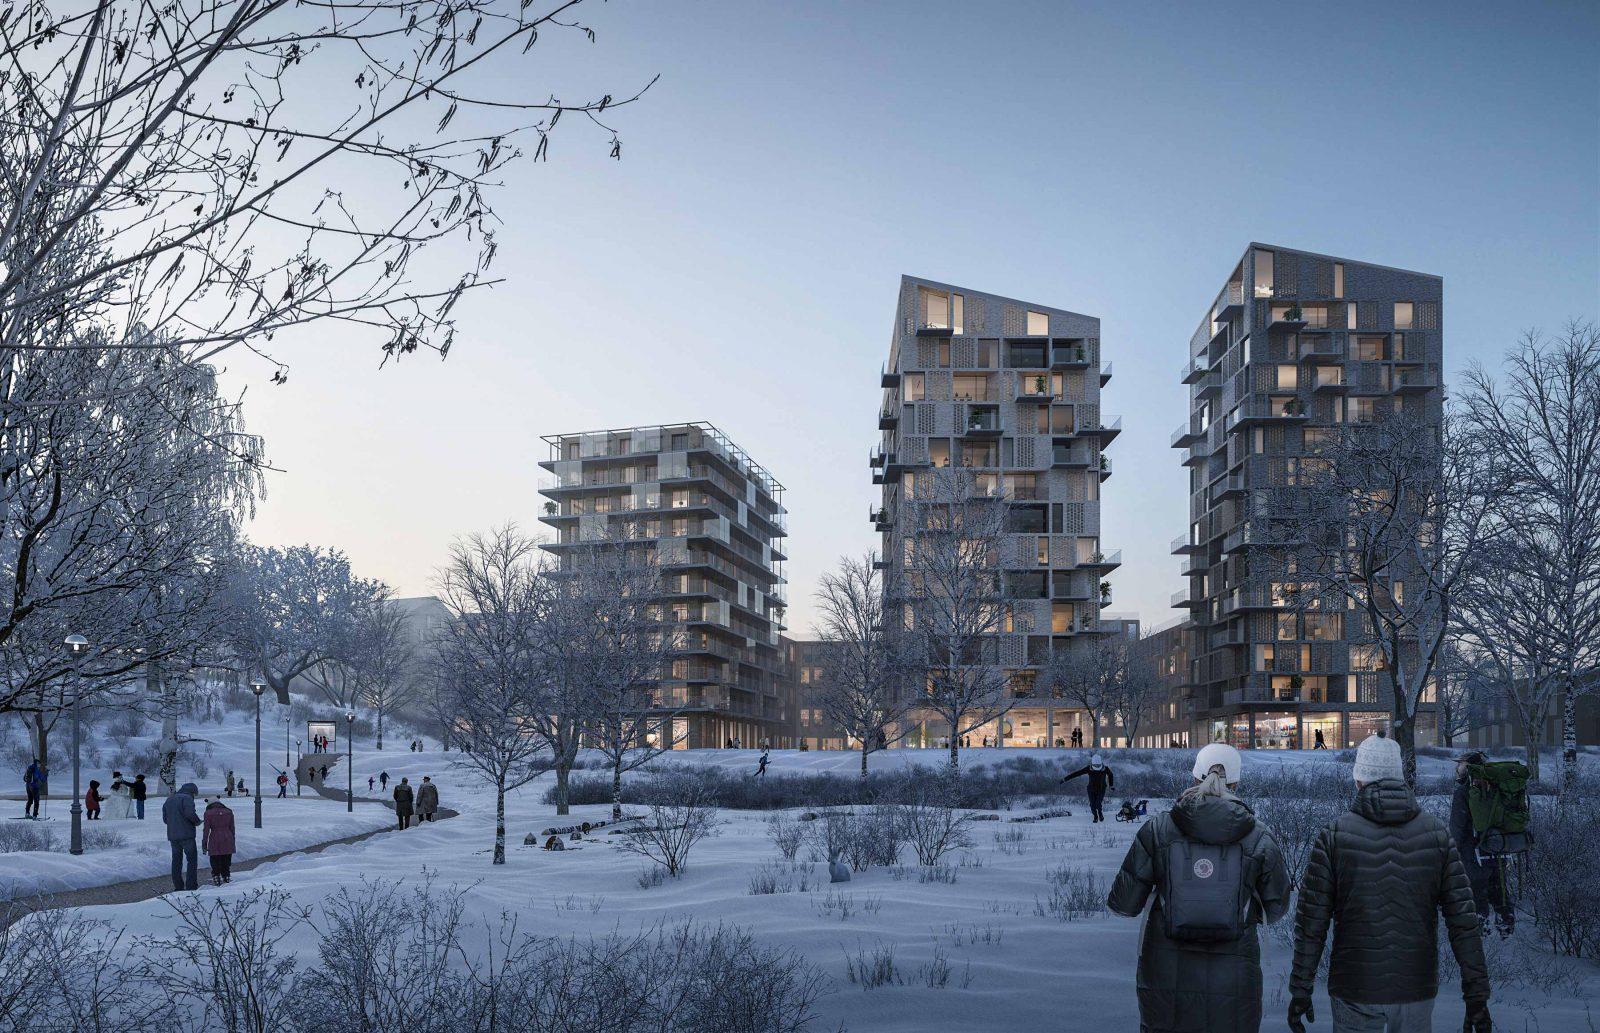 KjellanderSjoberg Storaskondal vinter 3600x2324px